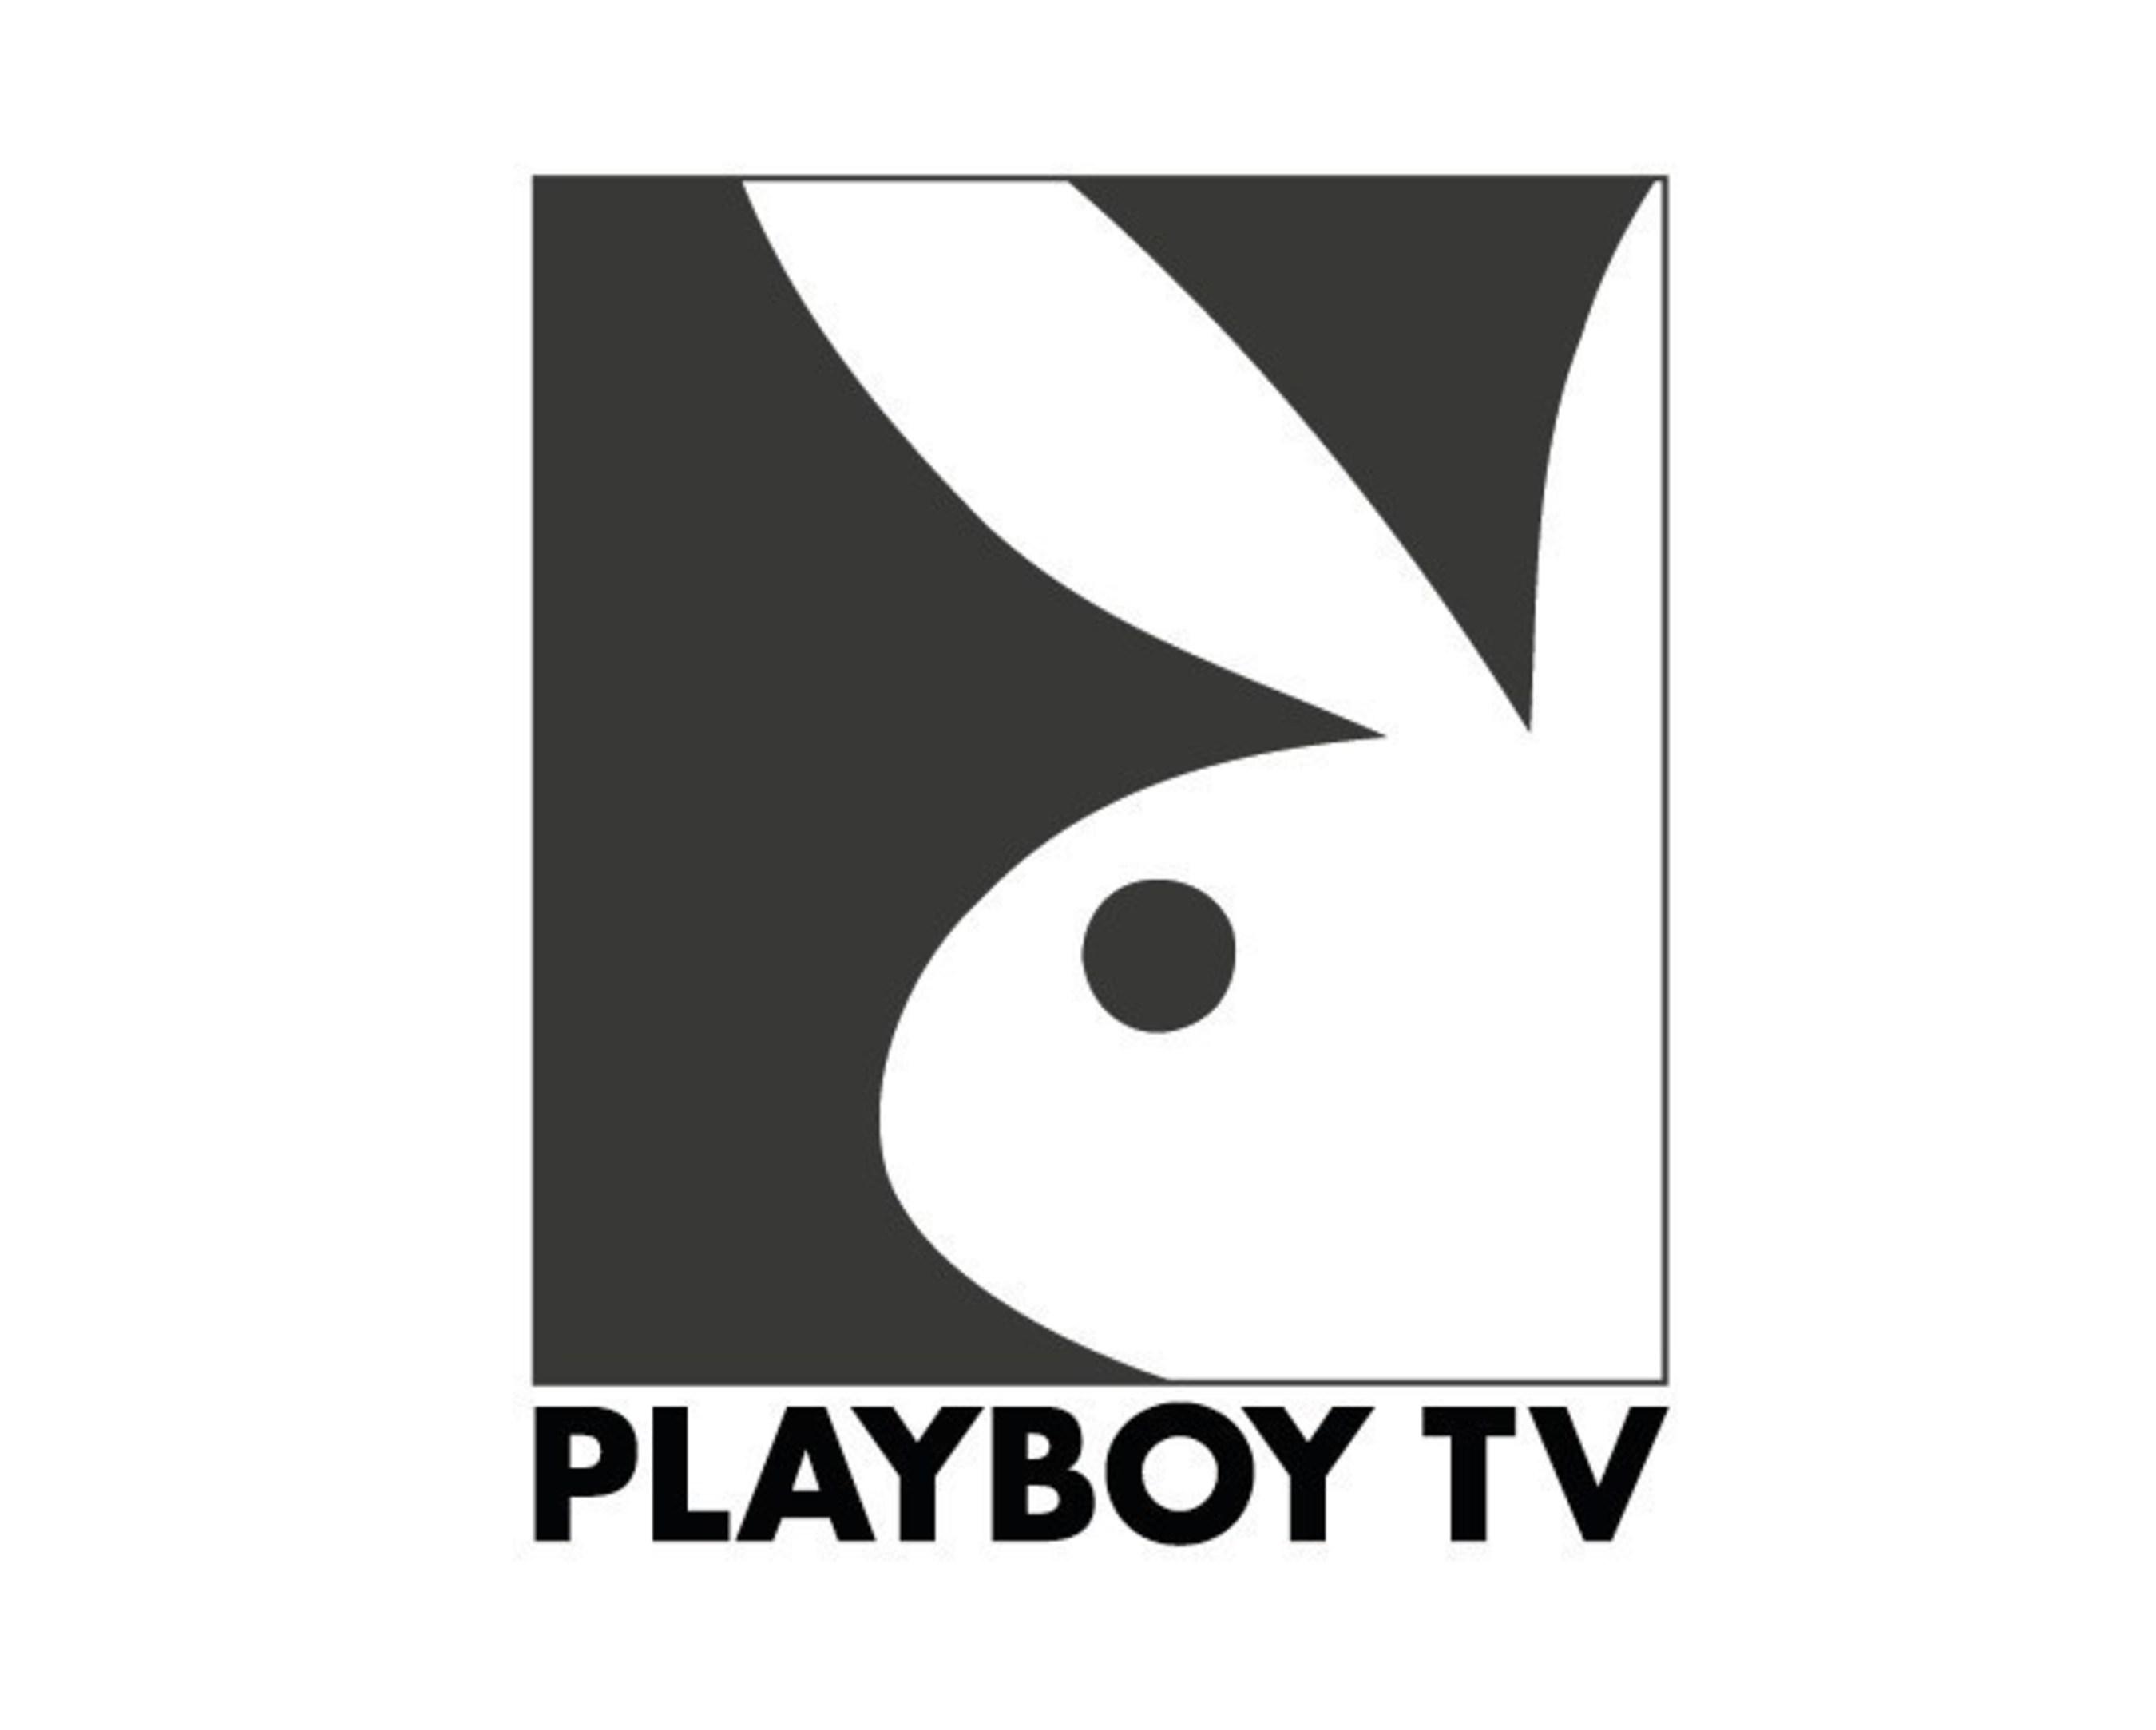 logo Playboy TV